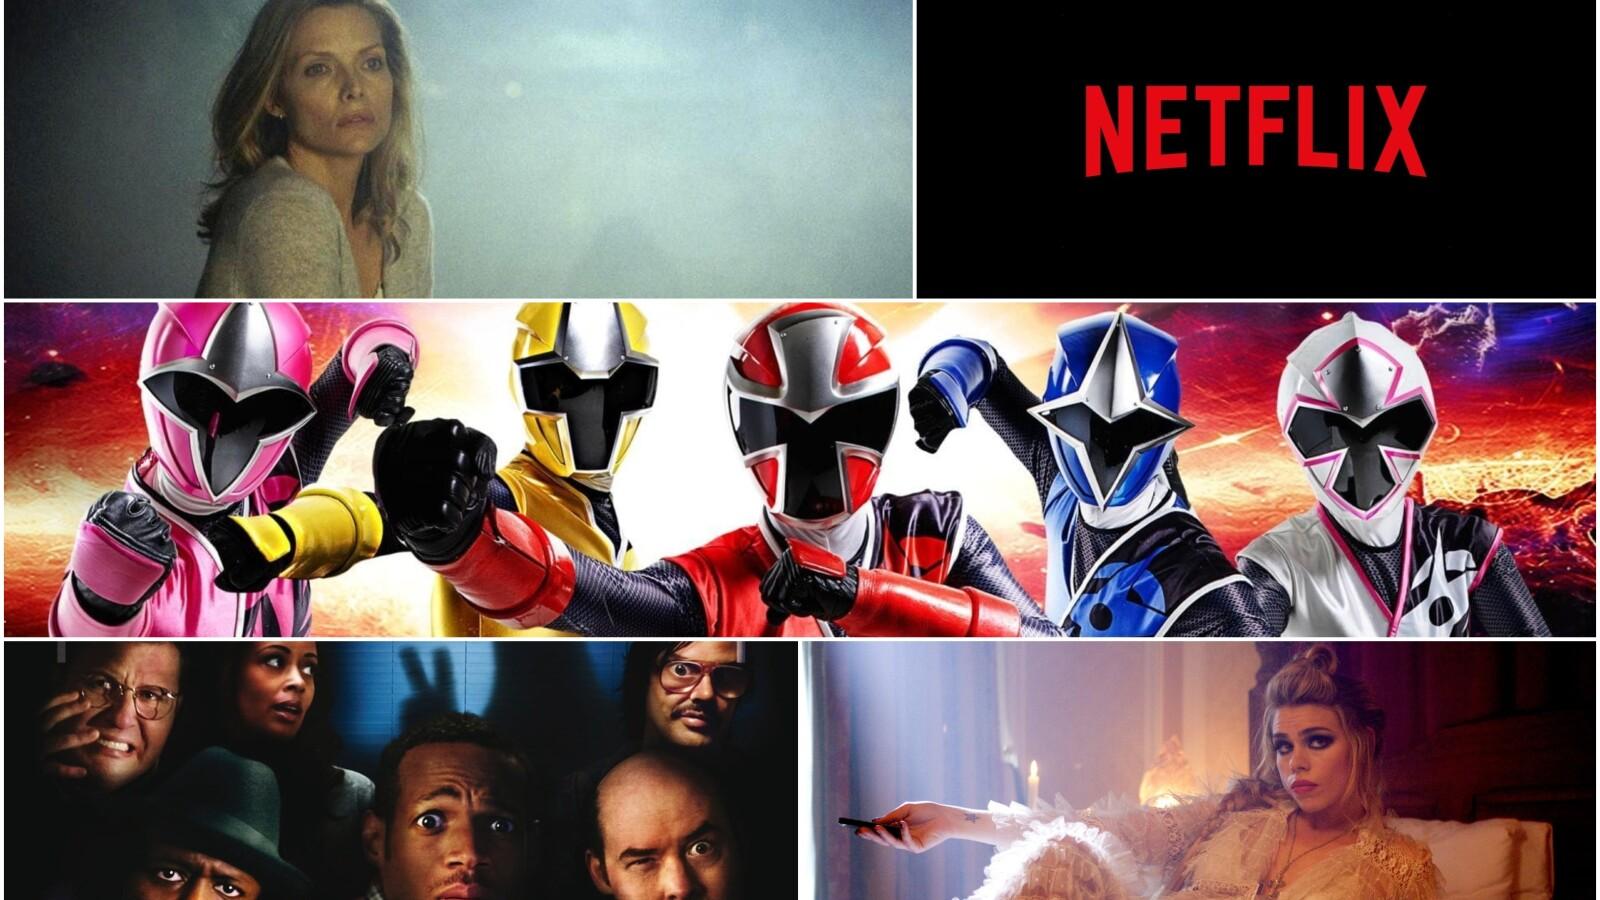 Netflix Welche Filme